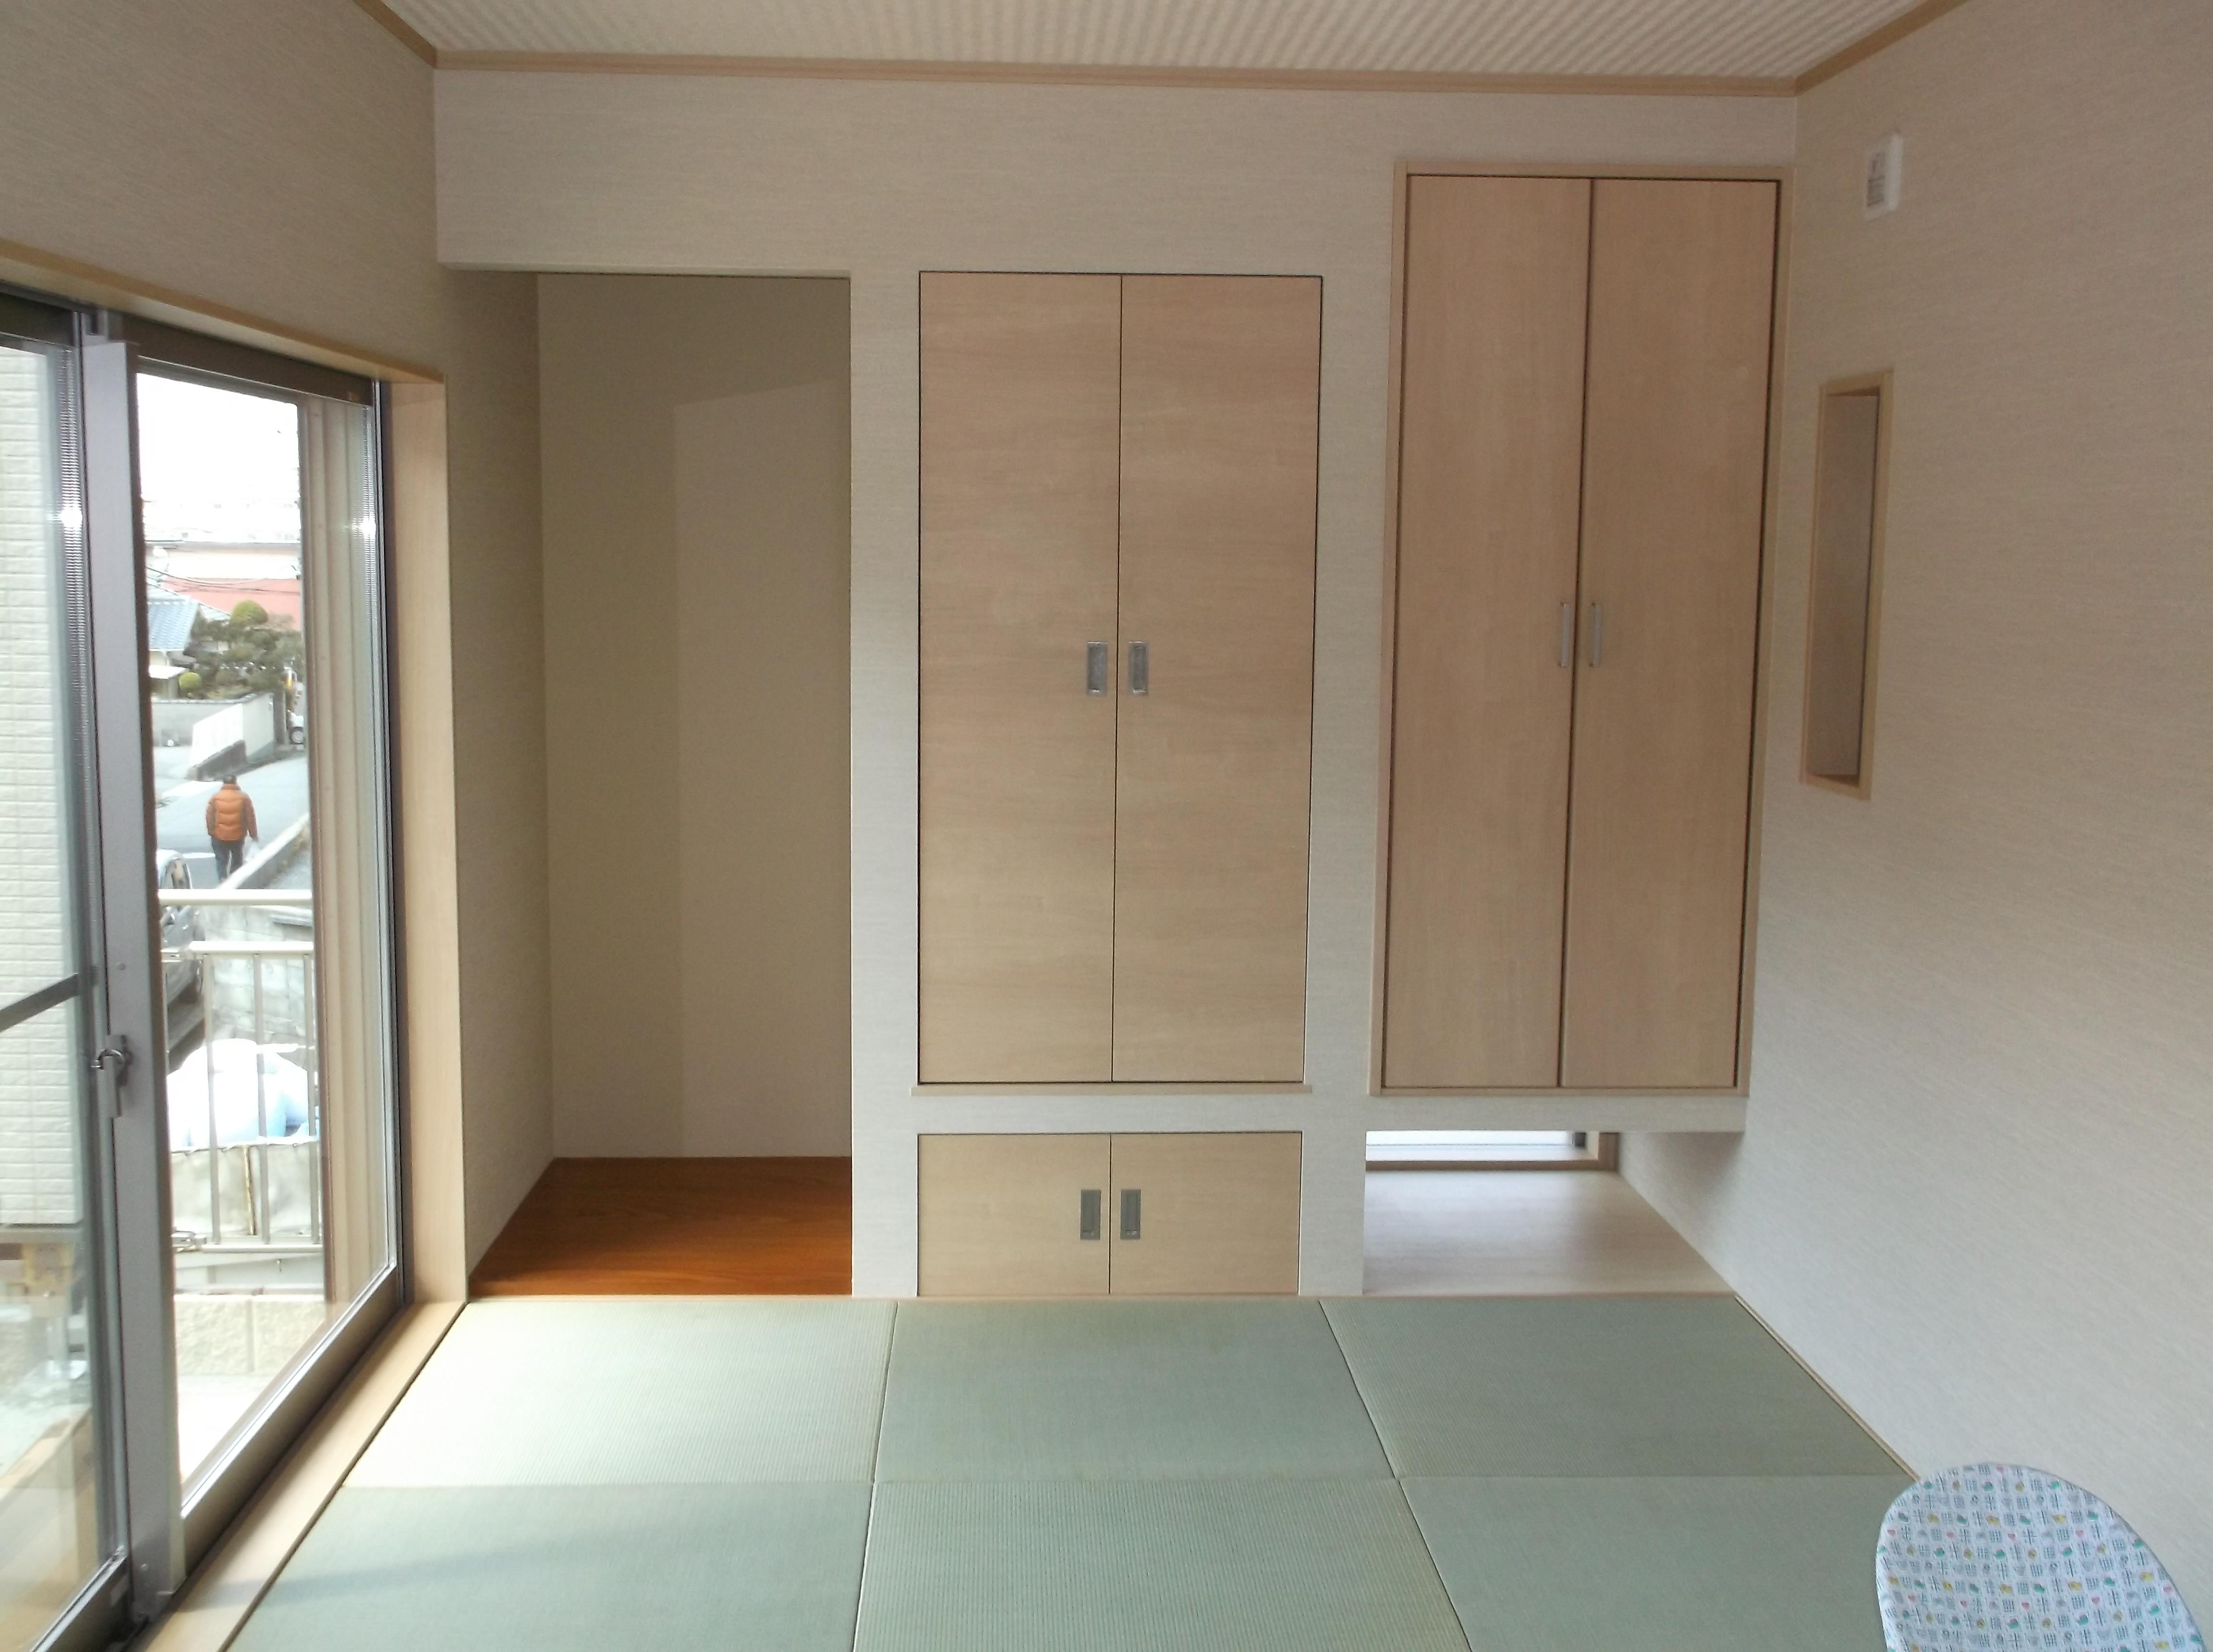 神戸市 個人住宅新築工事イメージ04